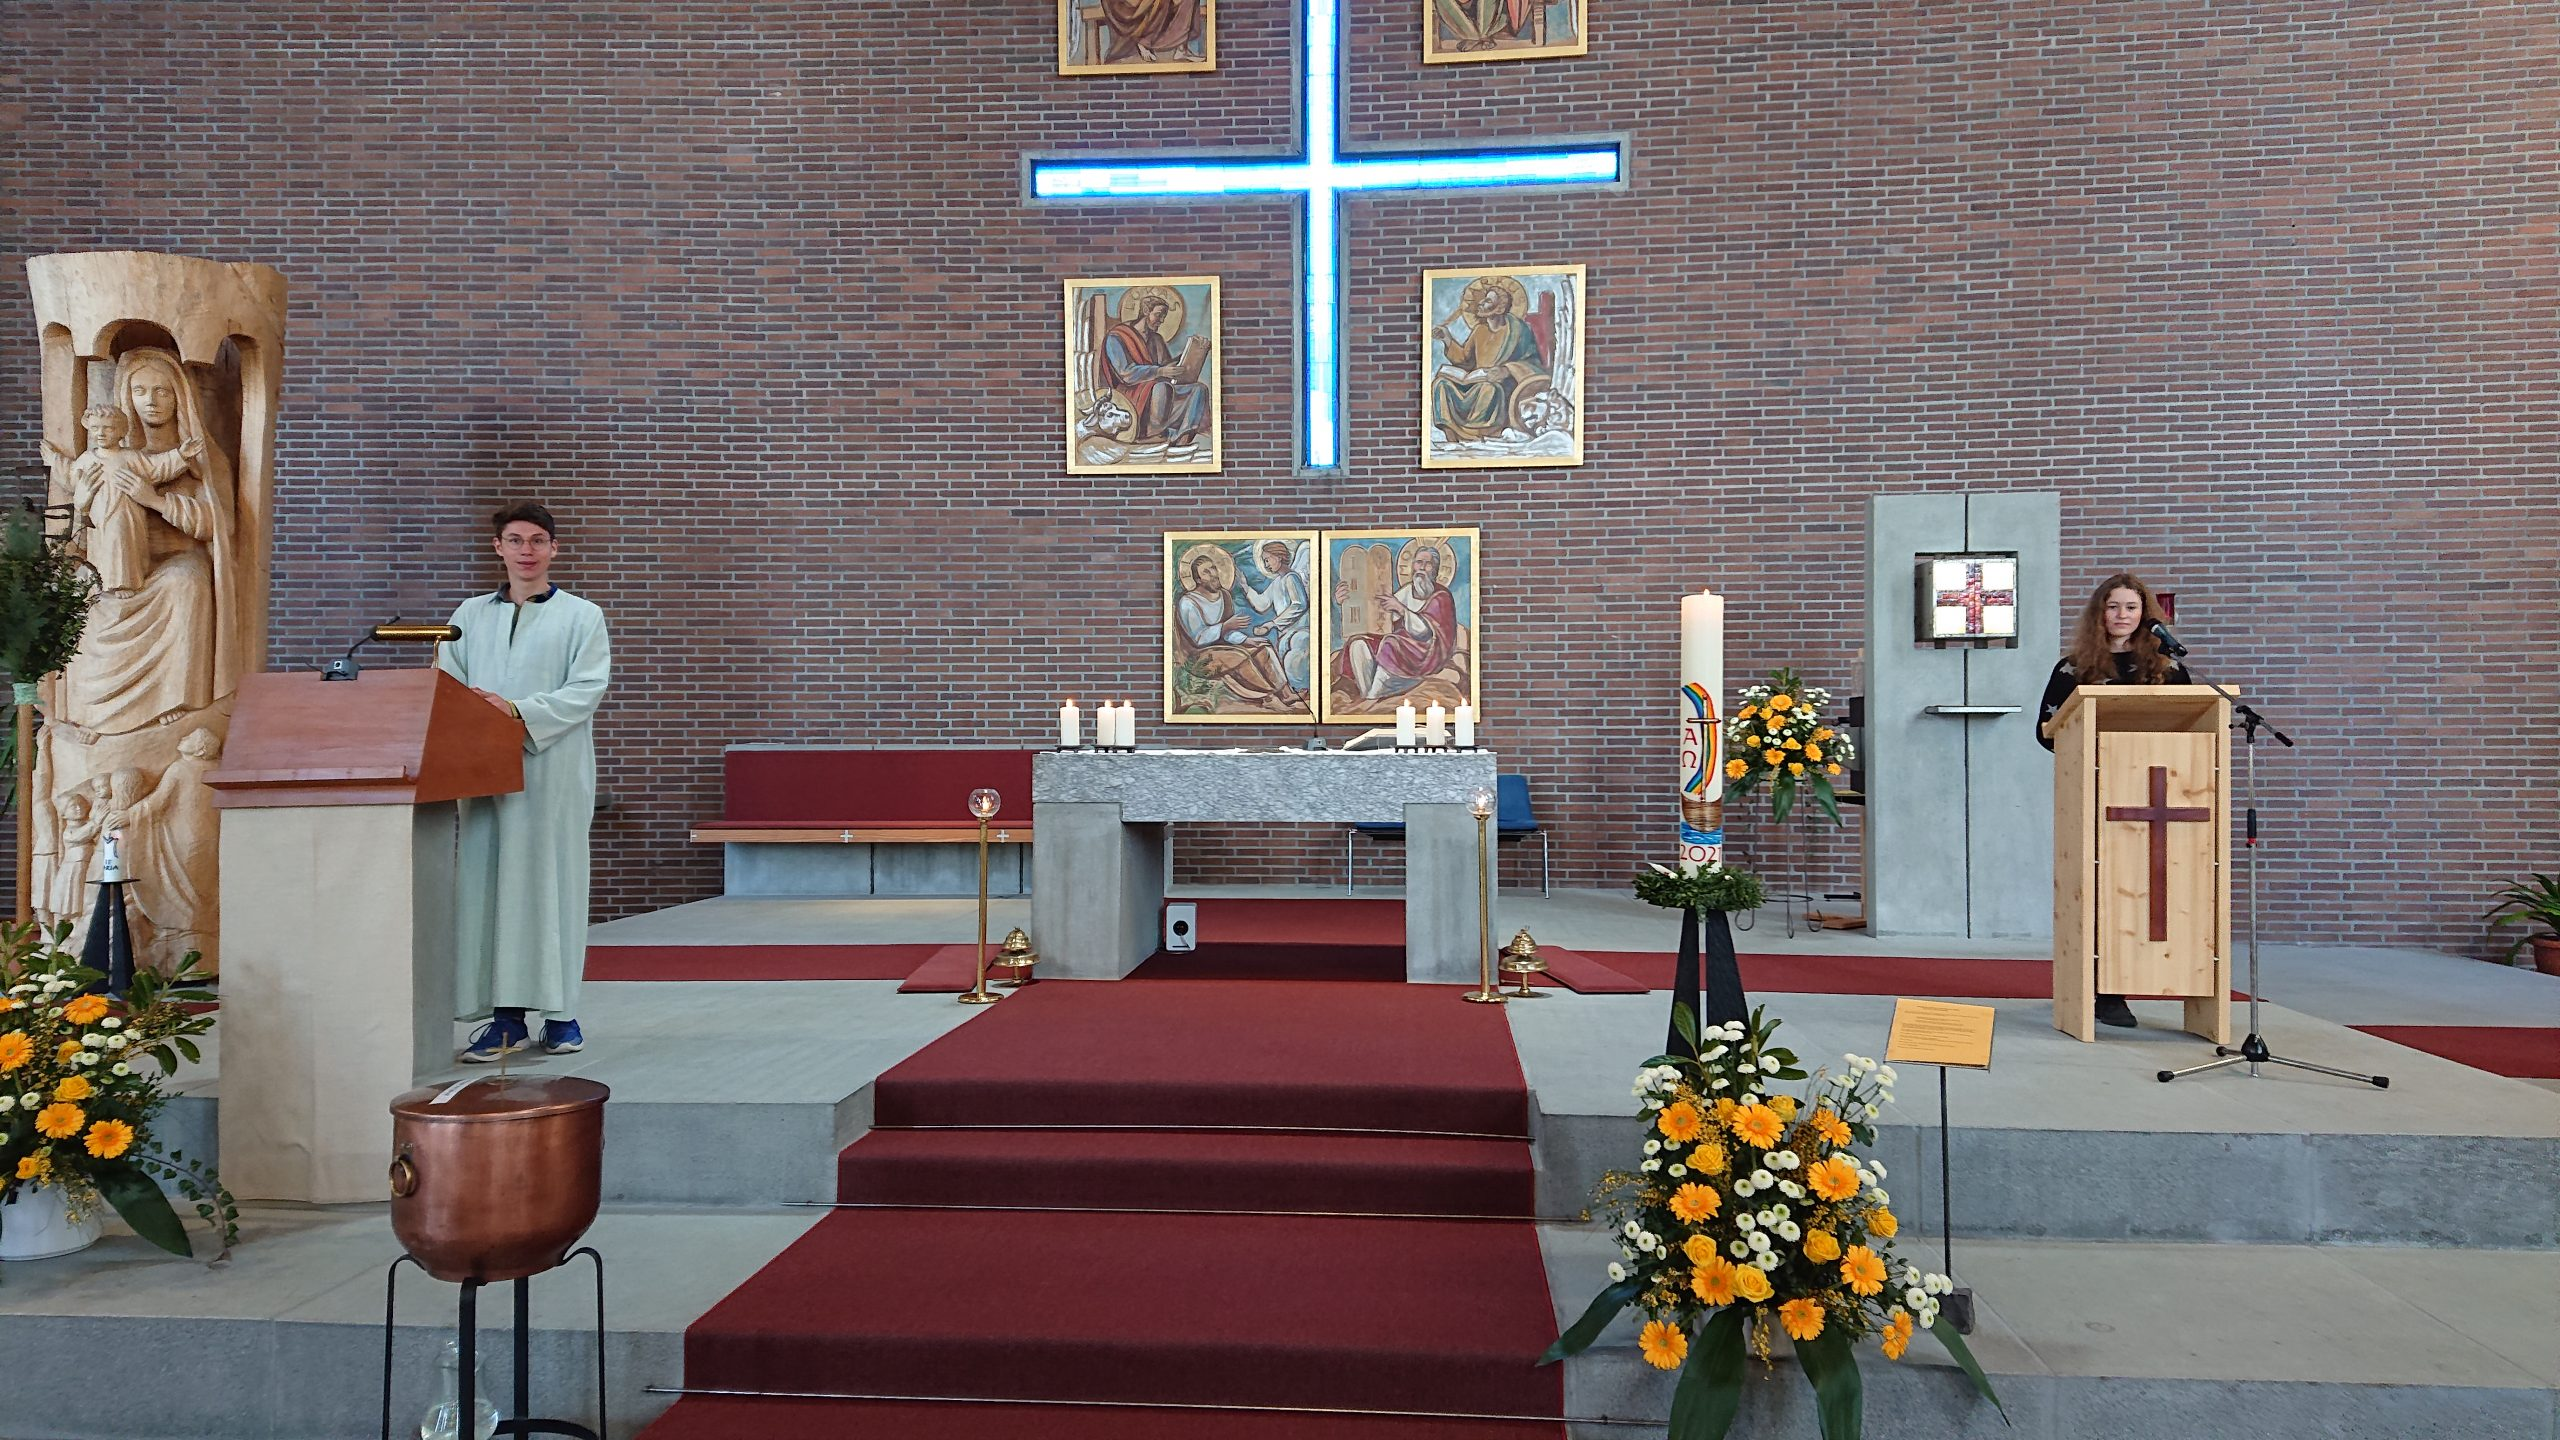 Familiengottesdienst am 11.4.21 in Weidach